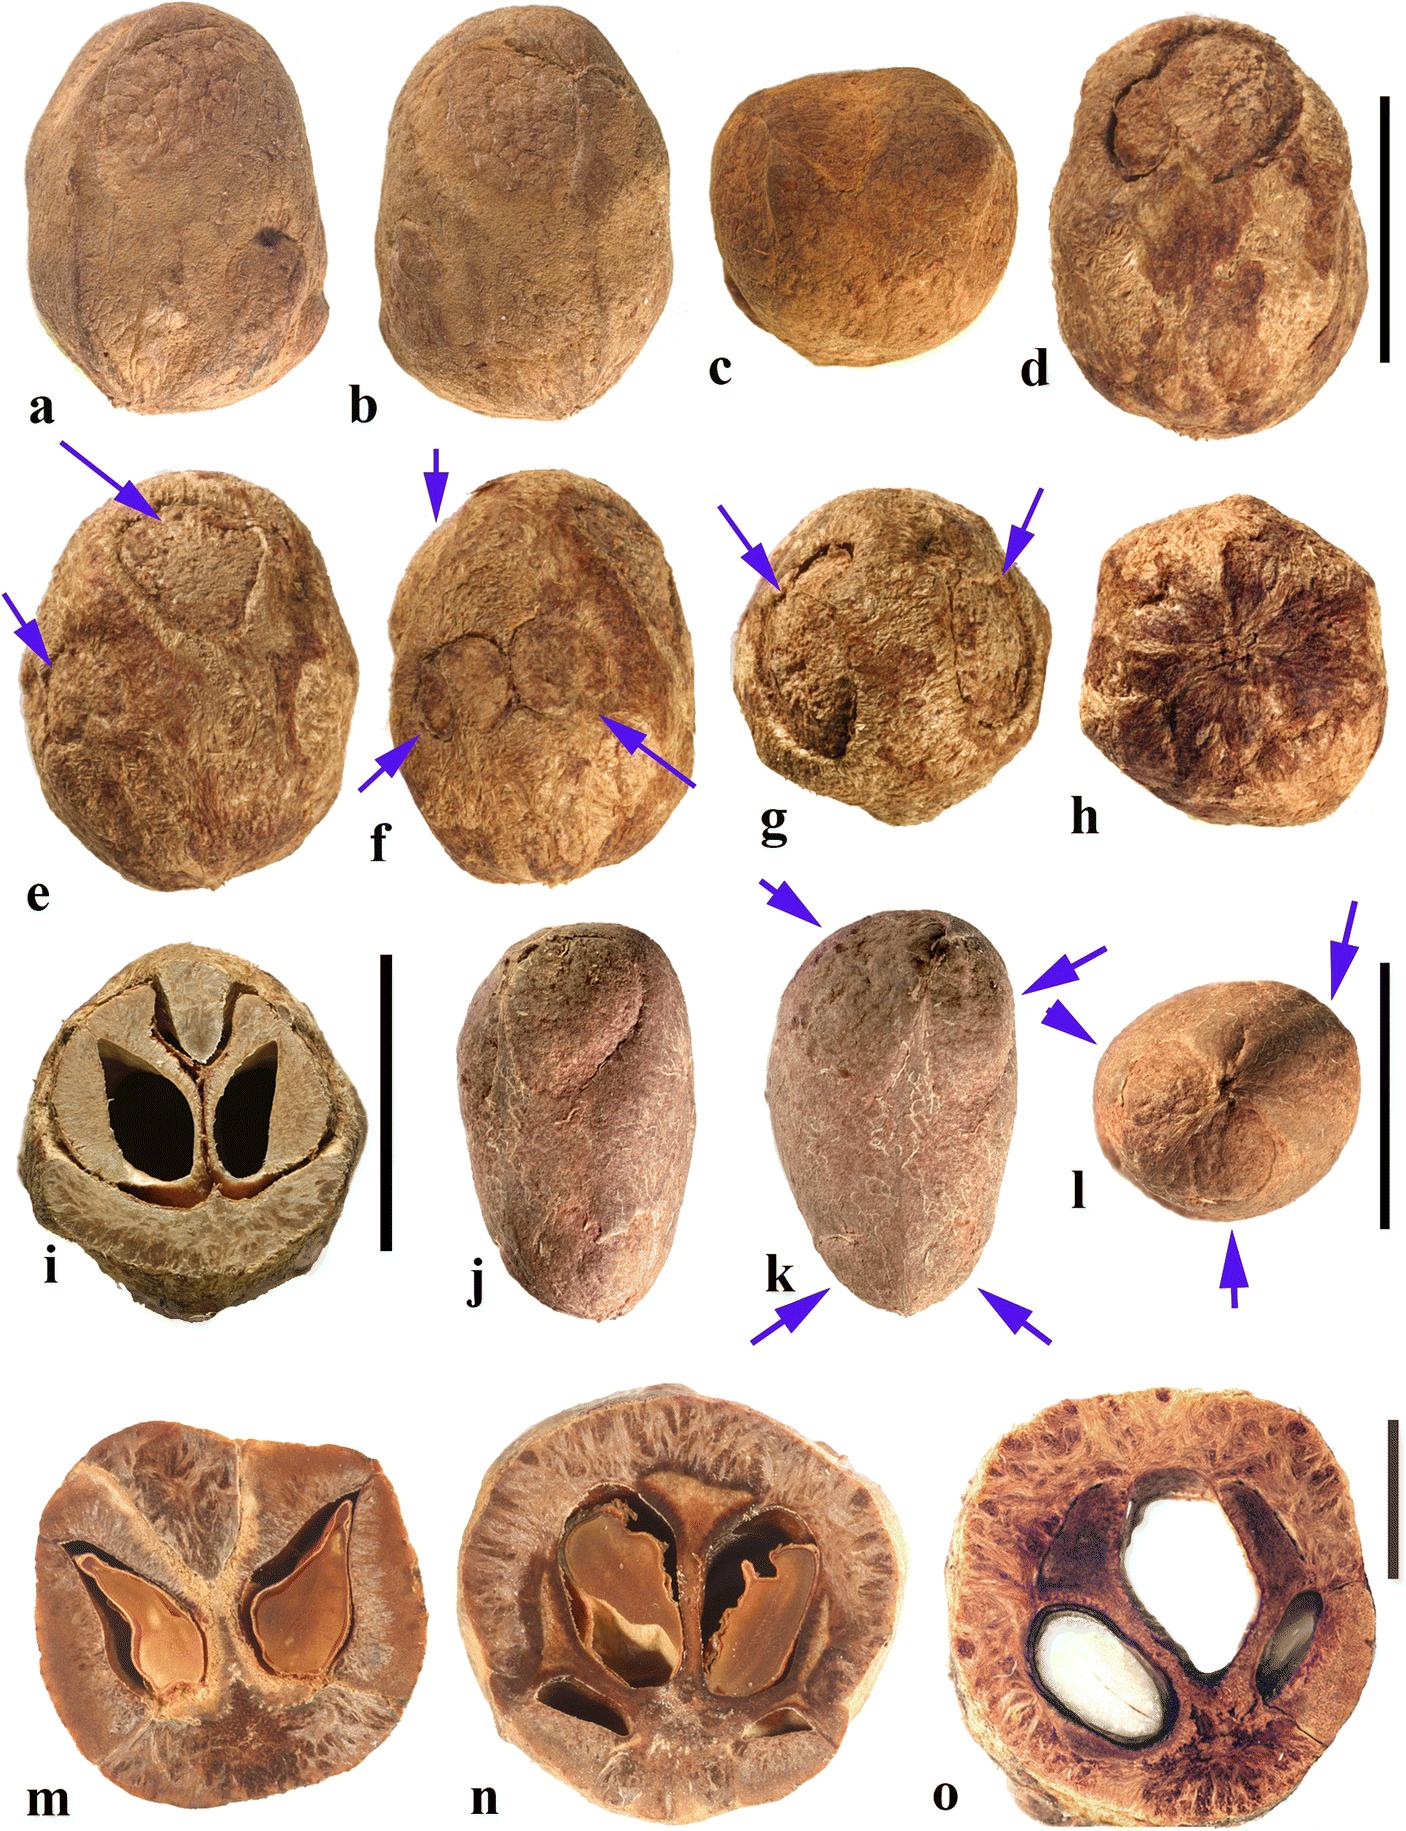 Fruit Morphology and Anatomy of the Spondioid Anacardiaceae